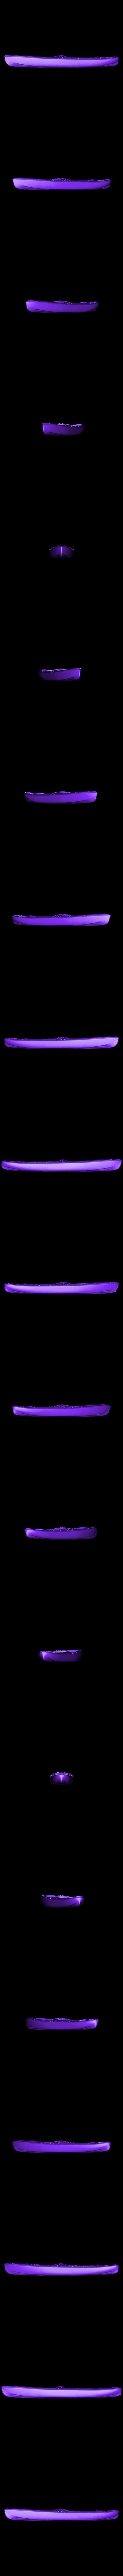 kayakhghg.STL Download STL file kayak • Design to 3D print, oussamaonoumi